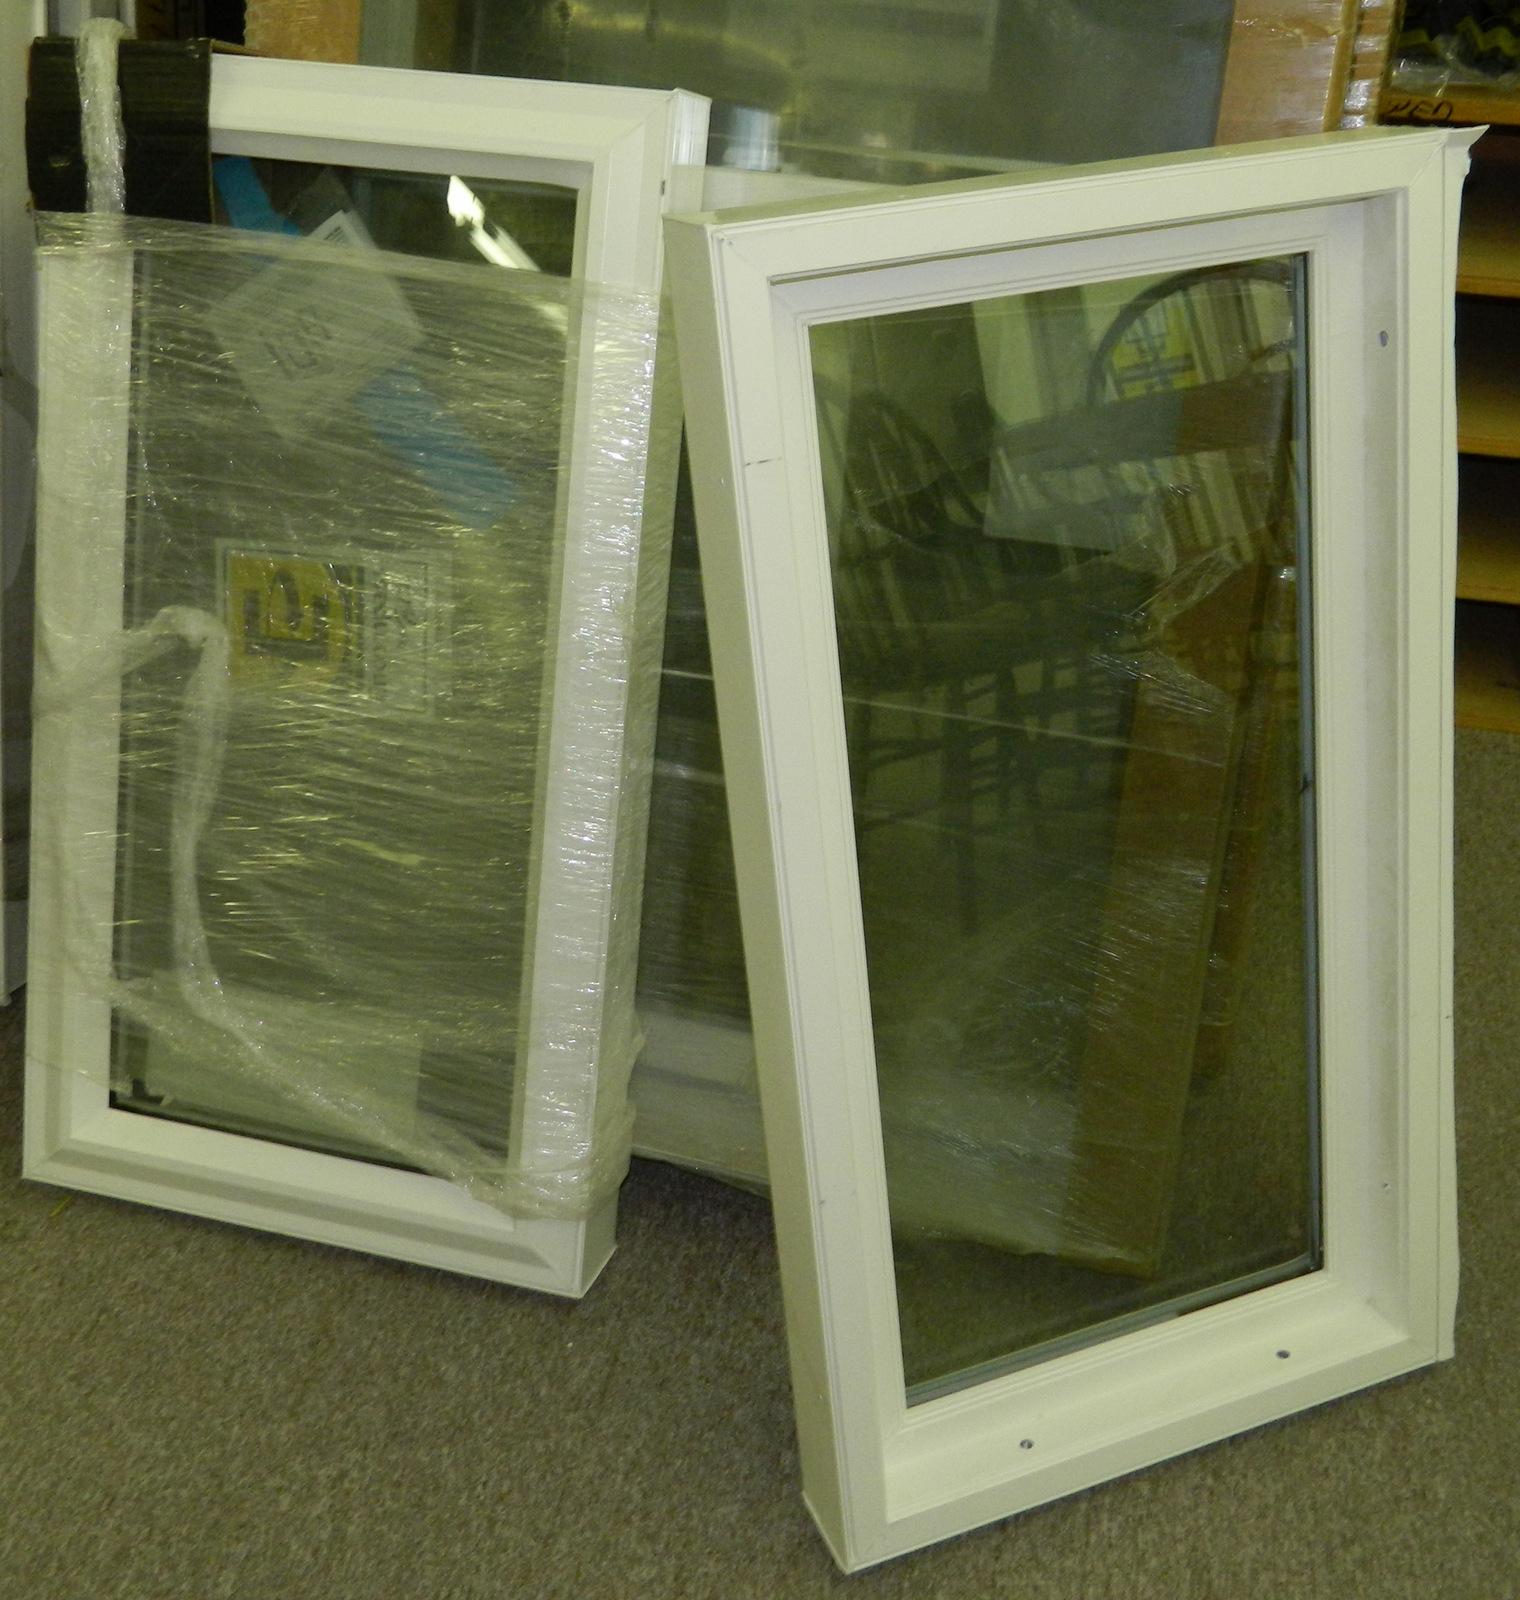 1600 #595127 Pella Windows And Doors Window Vinyl Double Hung Fixed 33.5 X 18 pic Cost Of Pella Doors 48111520